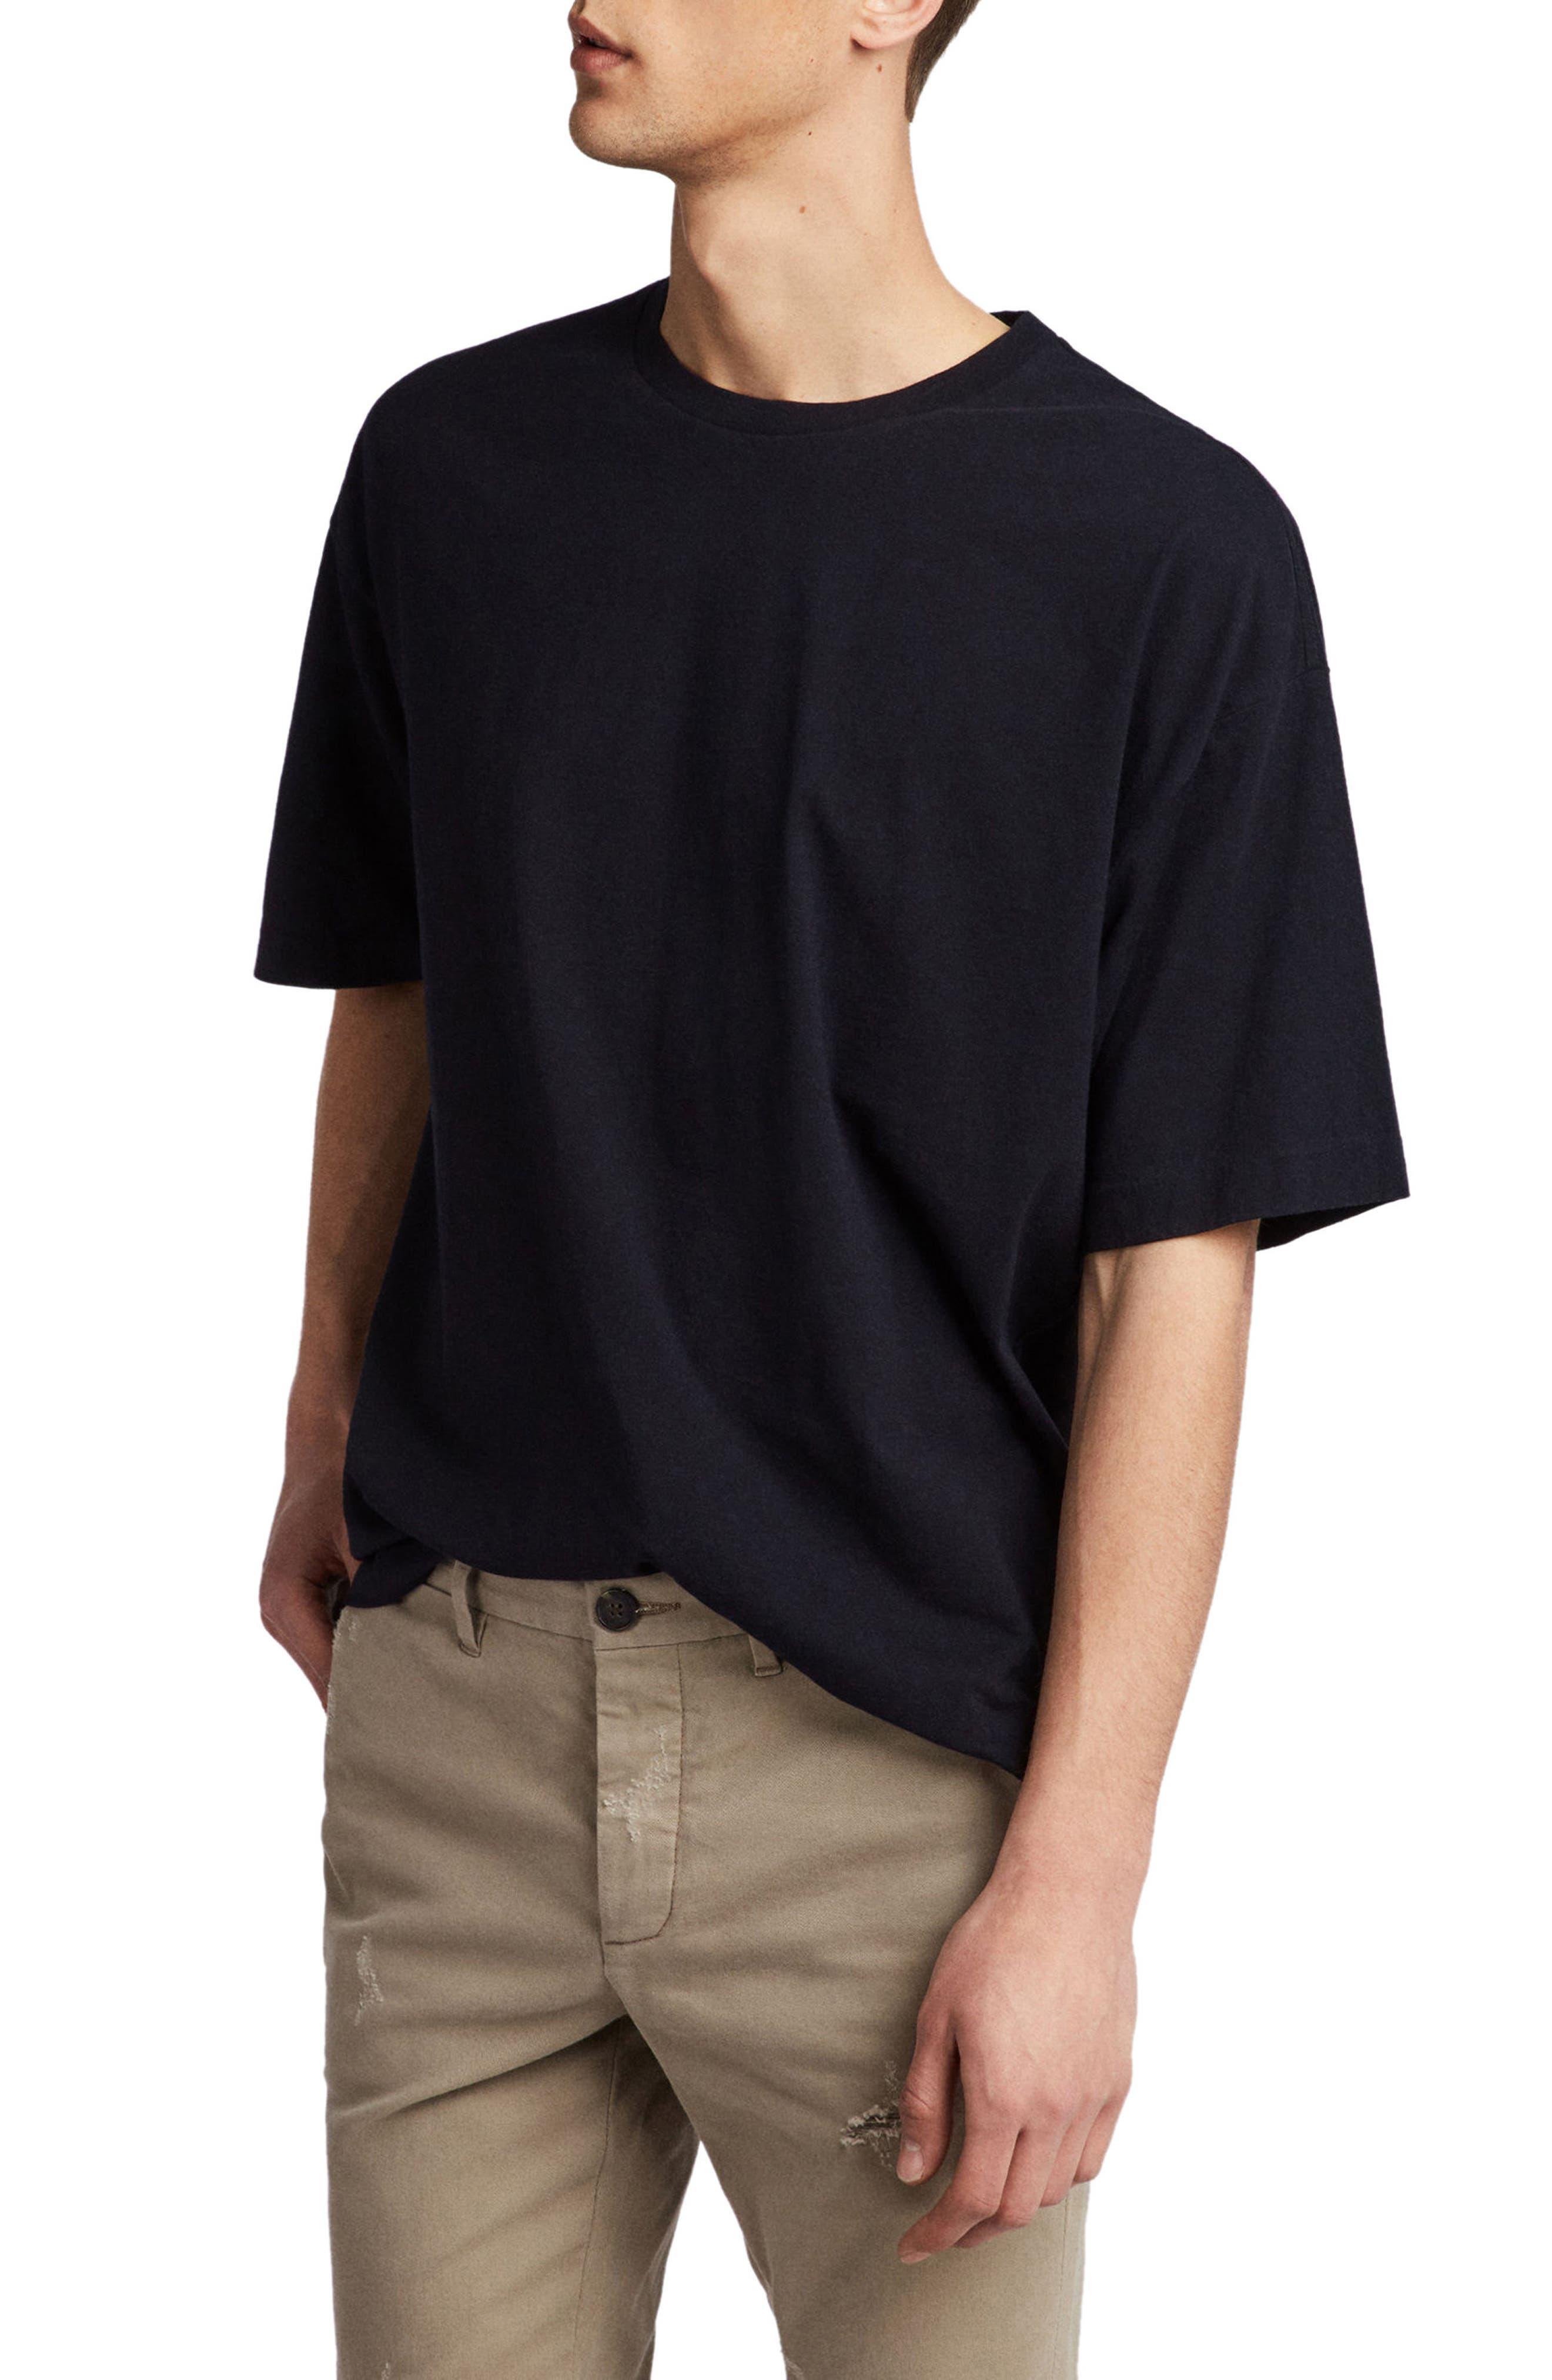 Atnom Crewneck T-Shirt,                             Alternate thumbnail 3, color,                             003